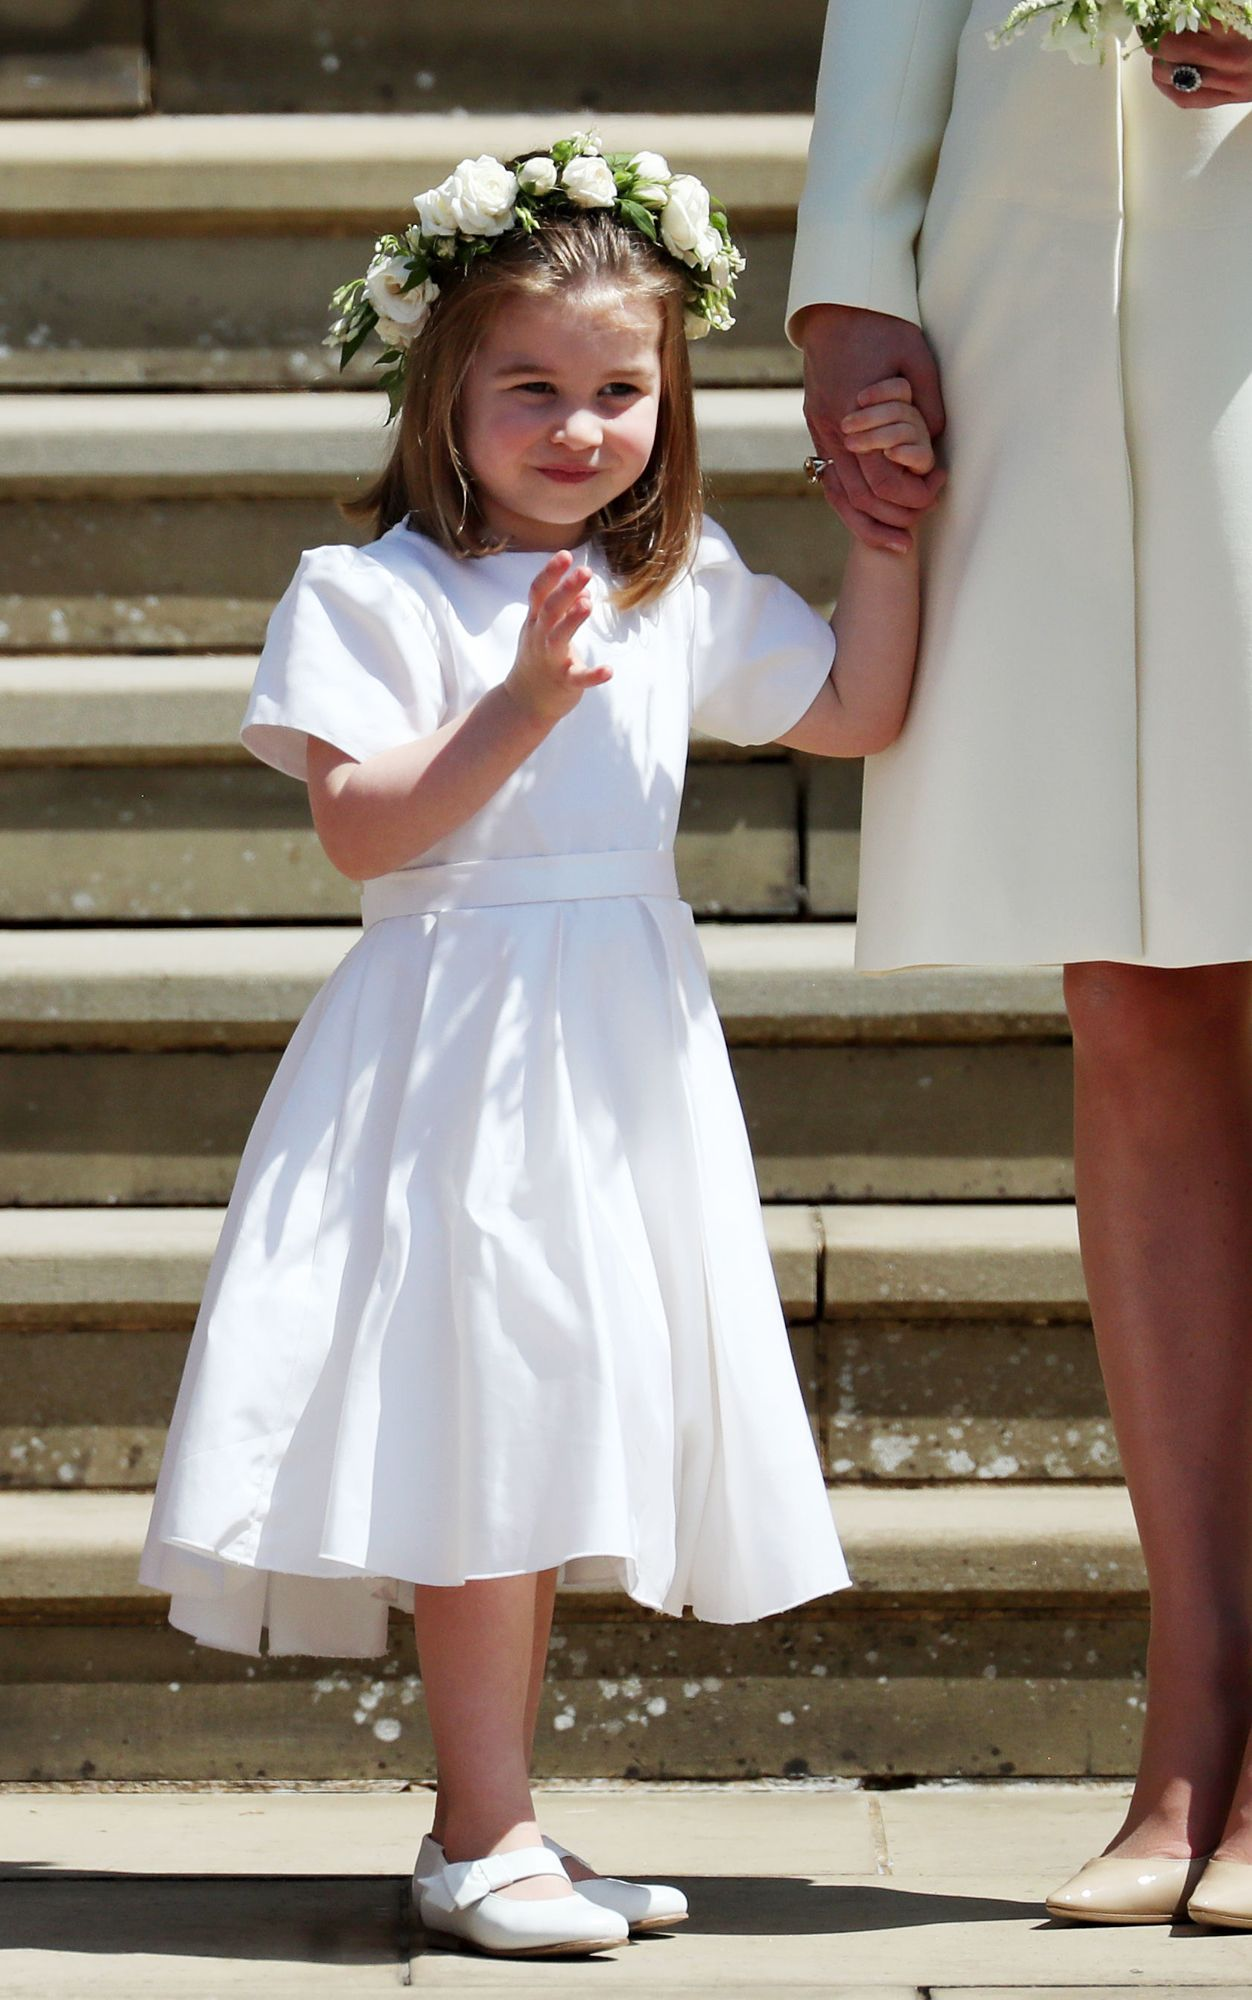 98fa845ad30 Every Adorable Photo of Prince George and Princess Charlotte at the Royal  Wedding